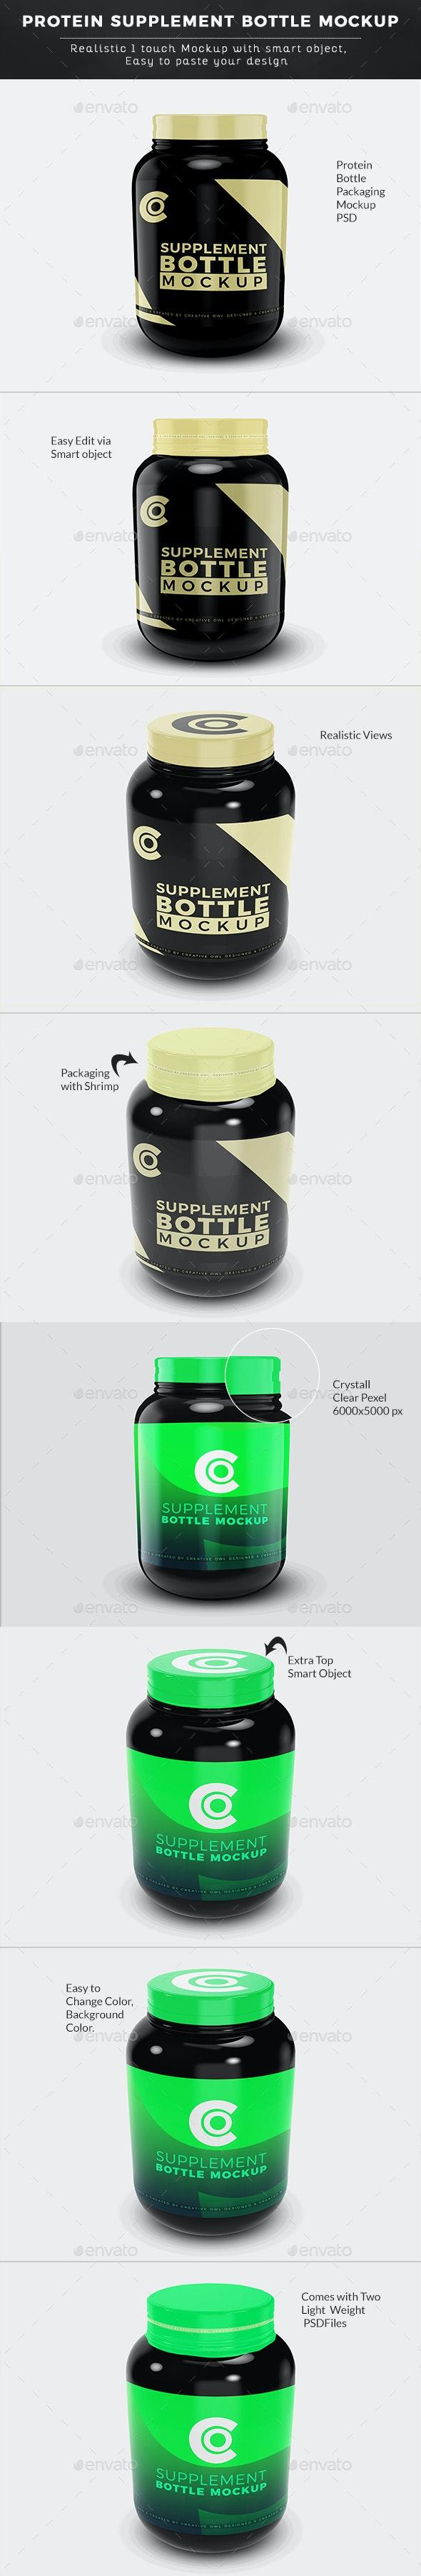 Protein Supplement Bottle Mockup - Packaging Product Mock-Ups